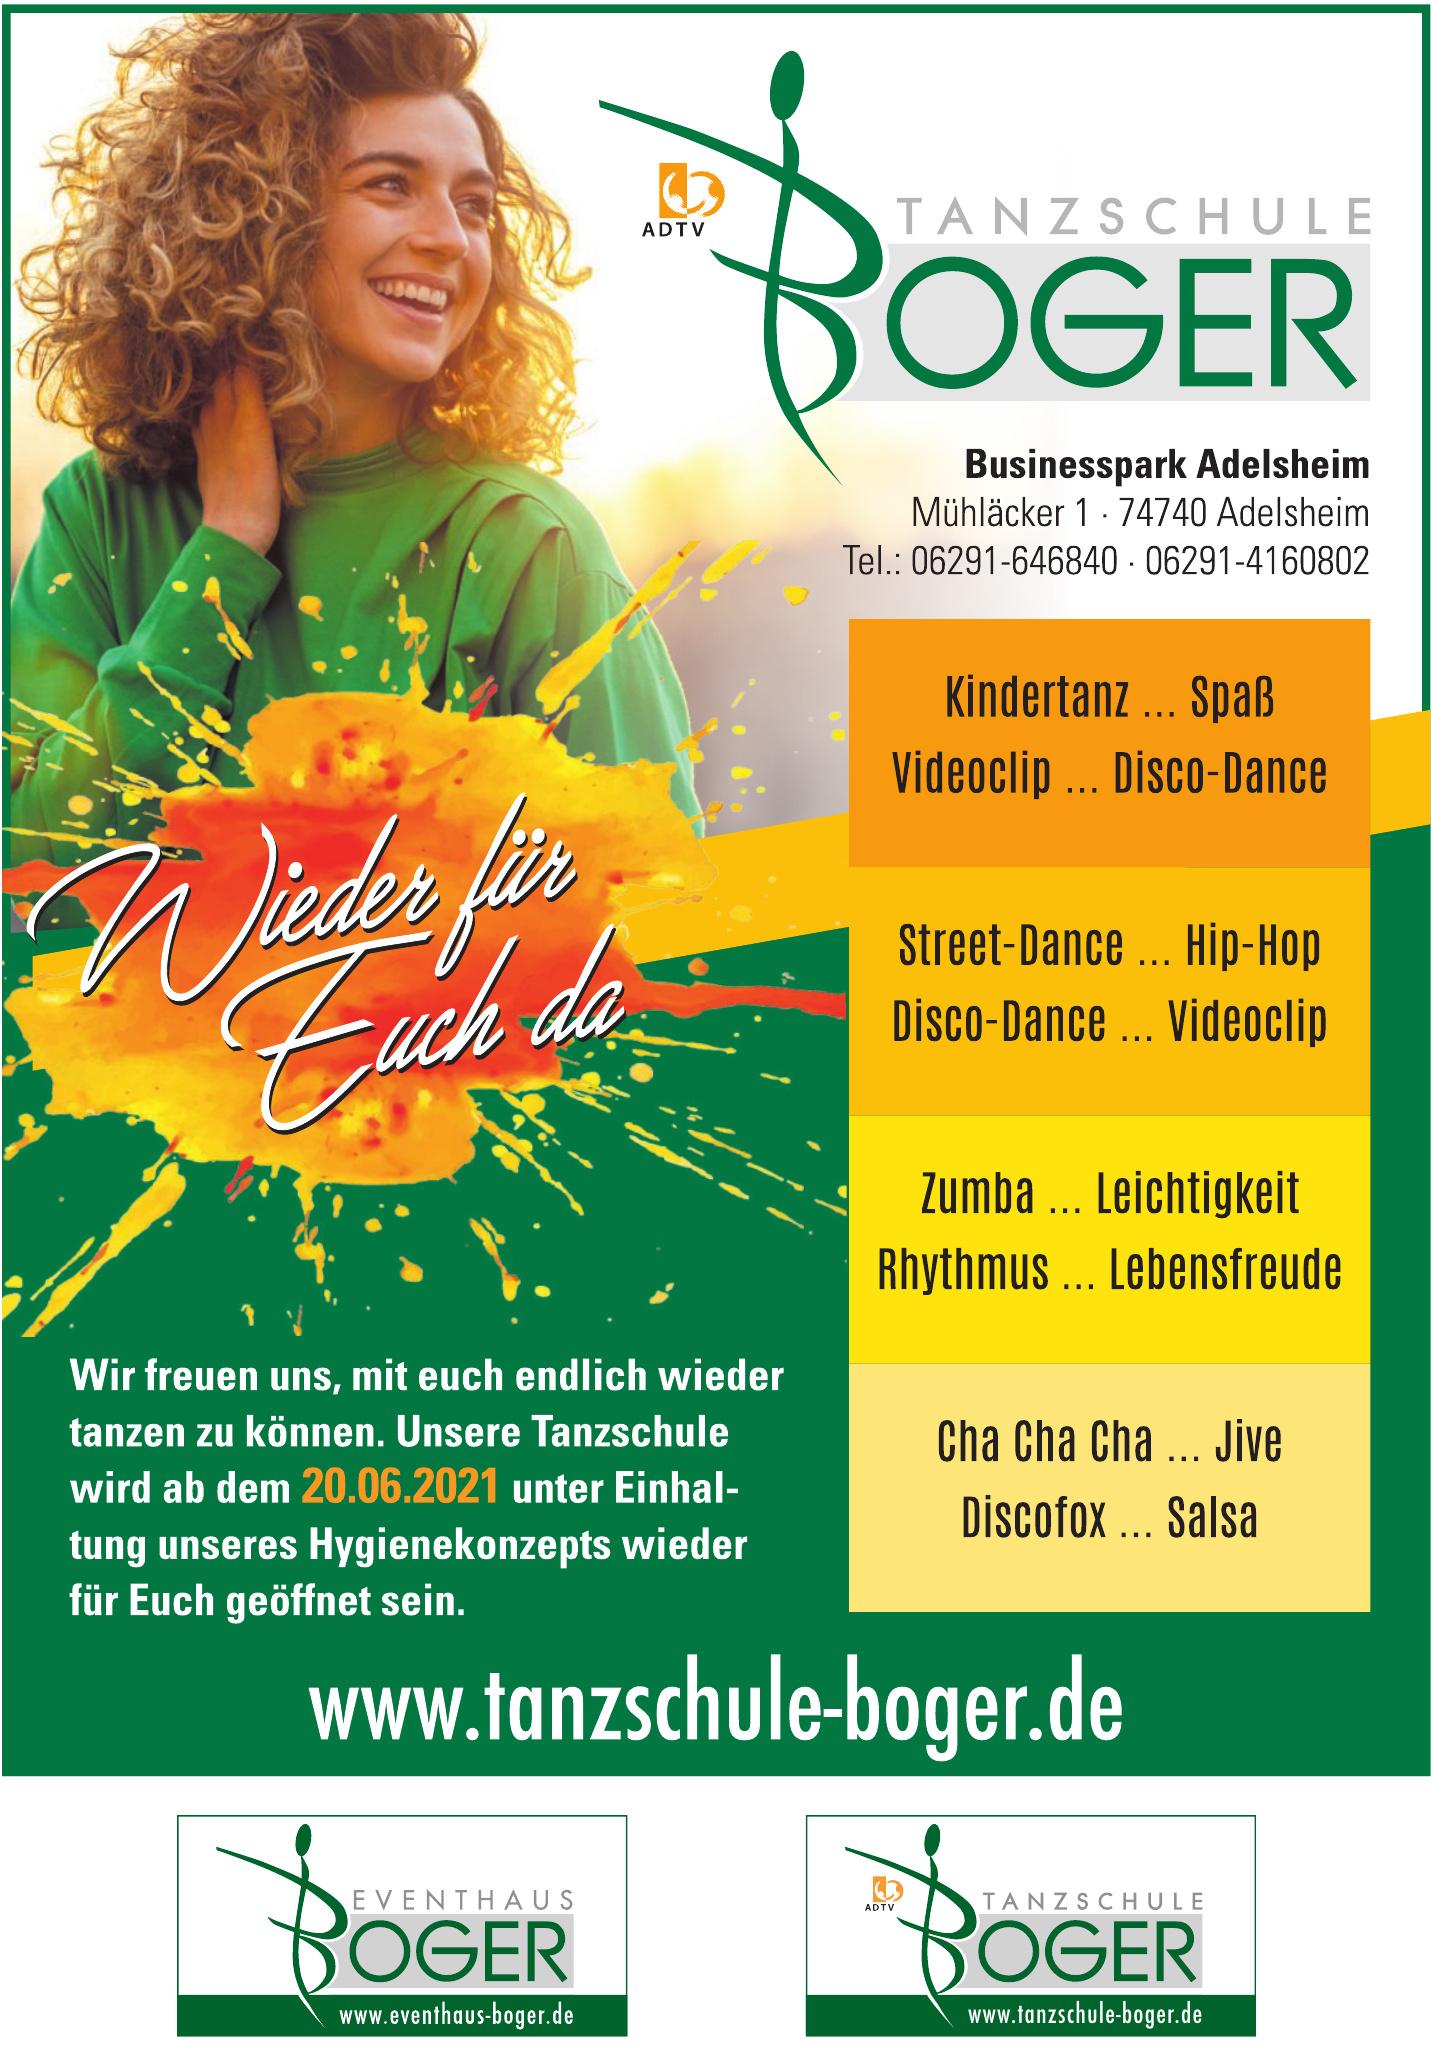 ADTV Tanzschule Boger